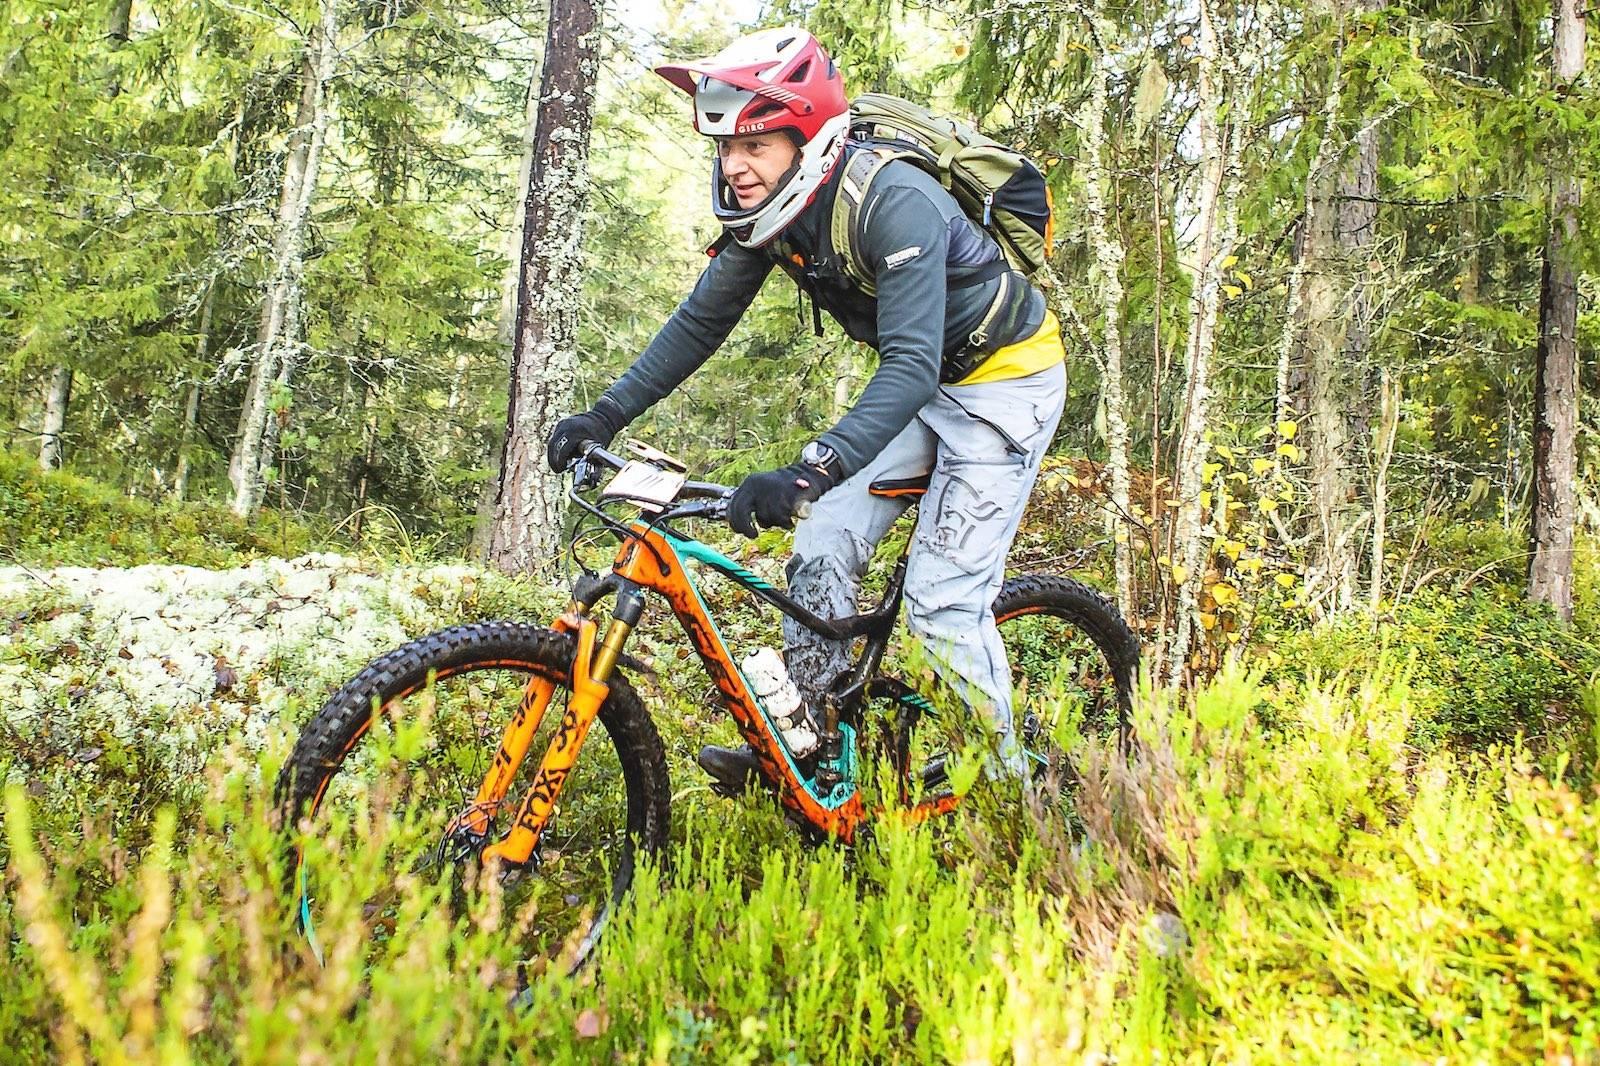 Knut Glad i fint dreiv gjennom skogen. Foto: Pål Westgaard